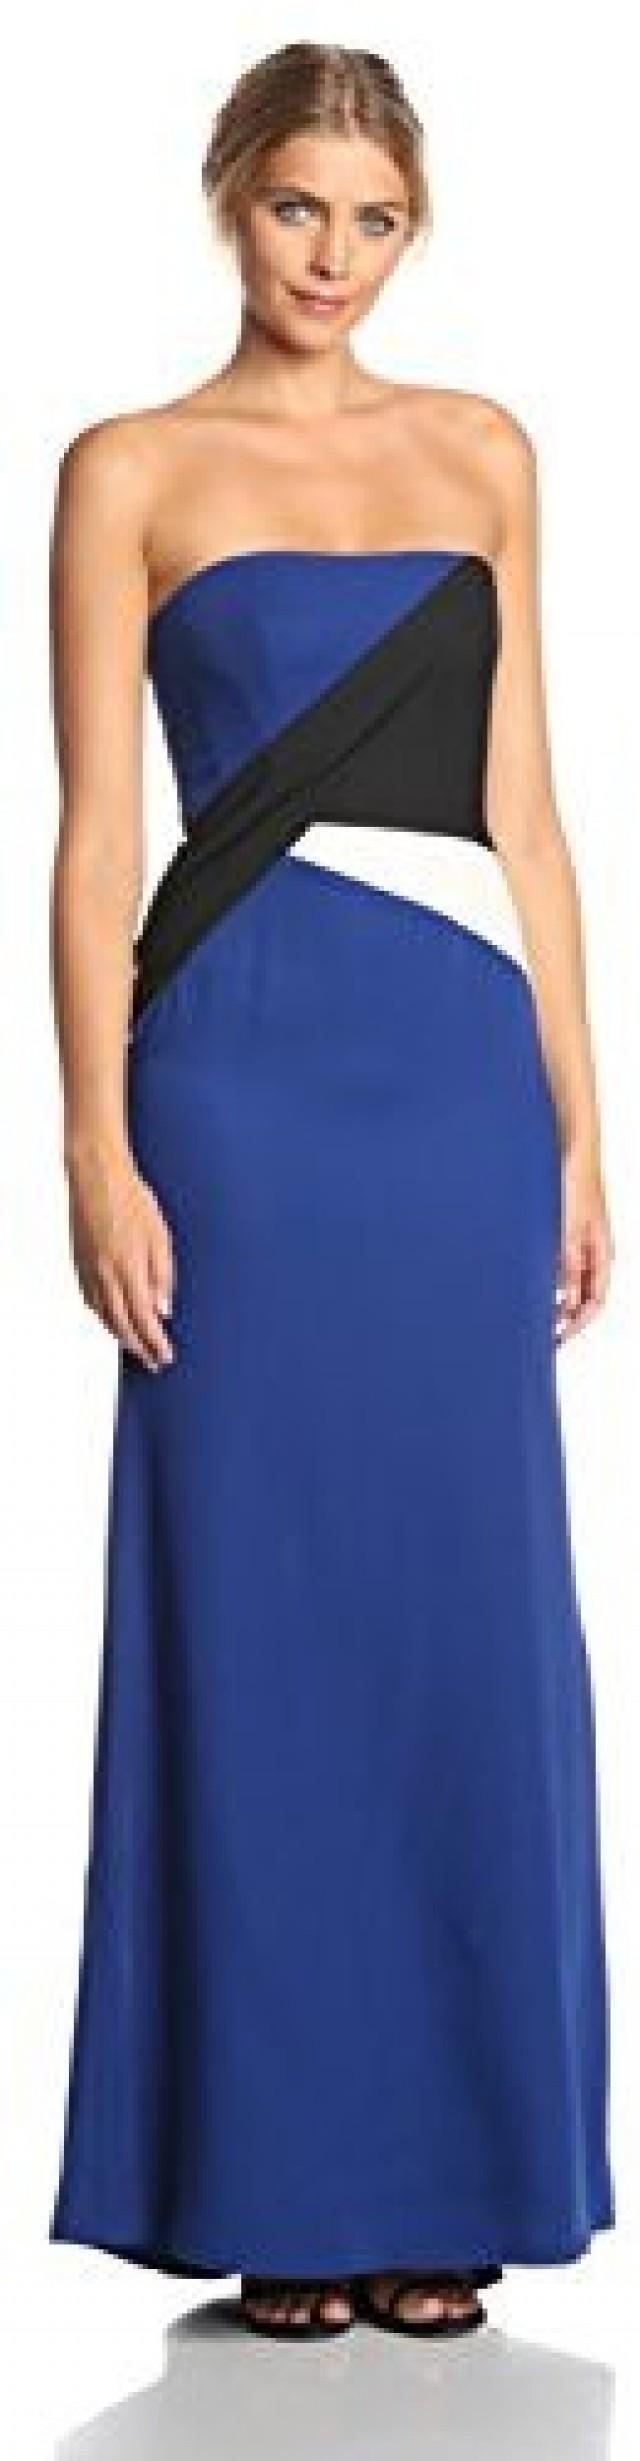 BCBGMAXAZRIA Women\'s Audrianna Strapless Colorblock Evening Gown ...